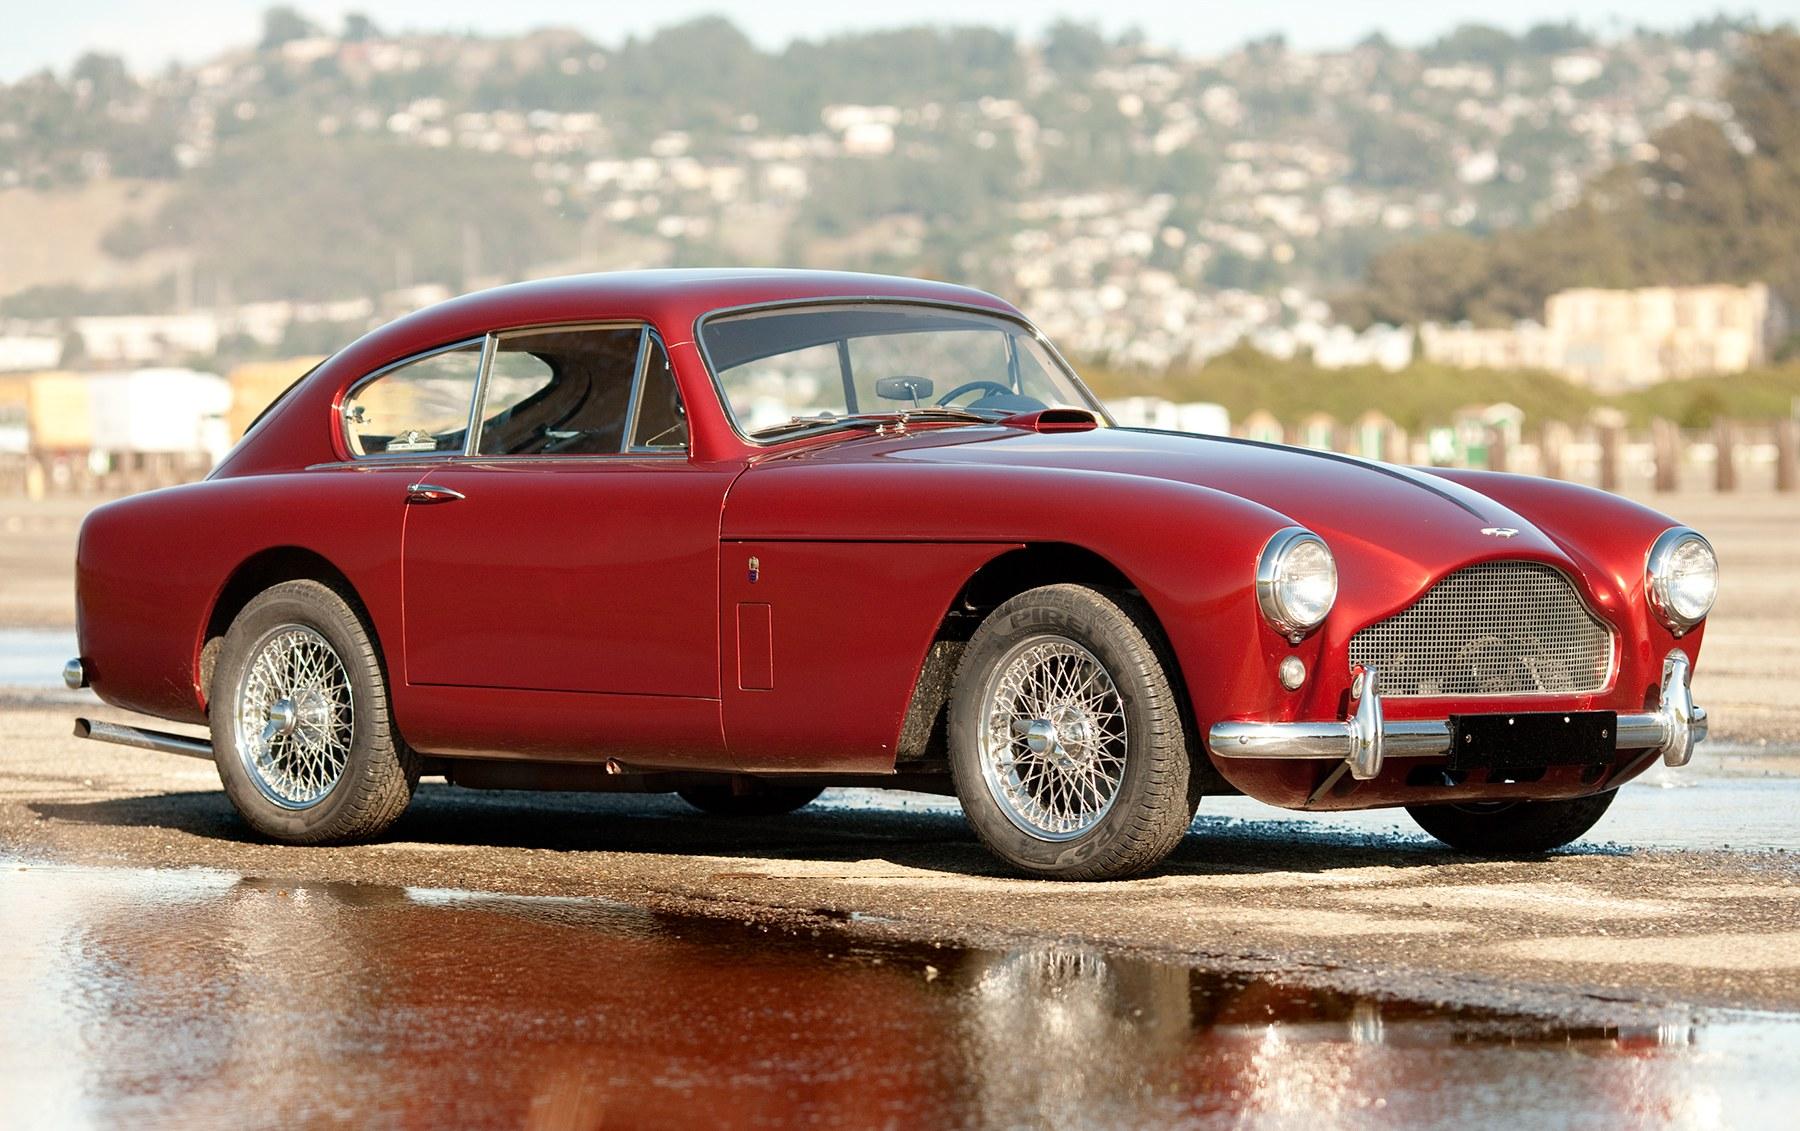 1959 Aston Martin DB Mark III Saloon